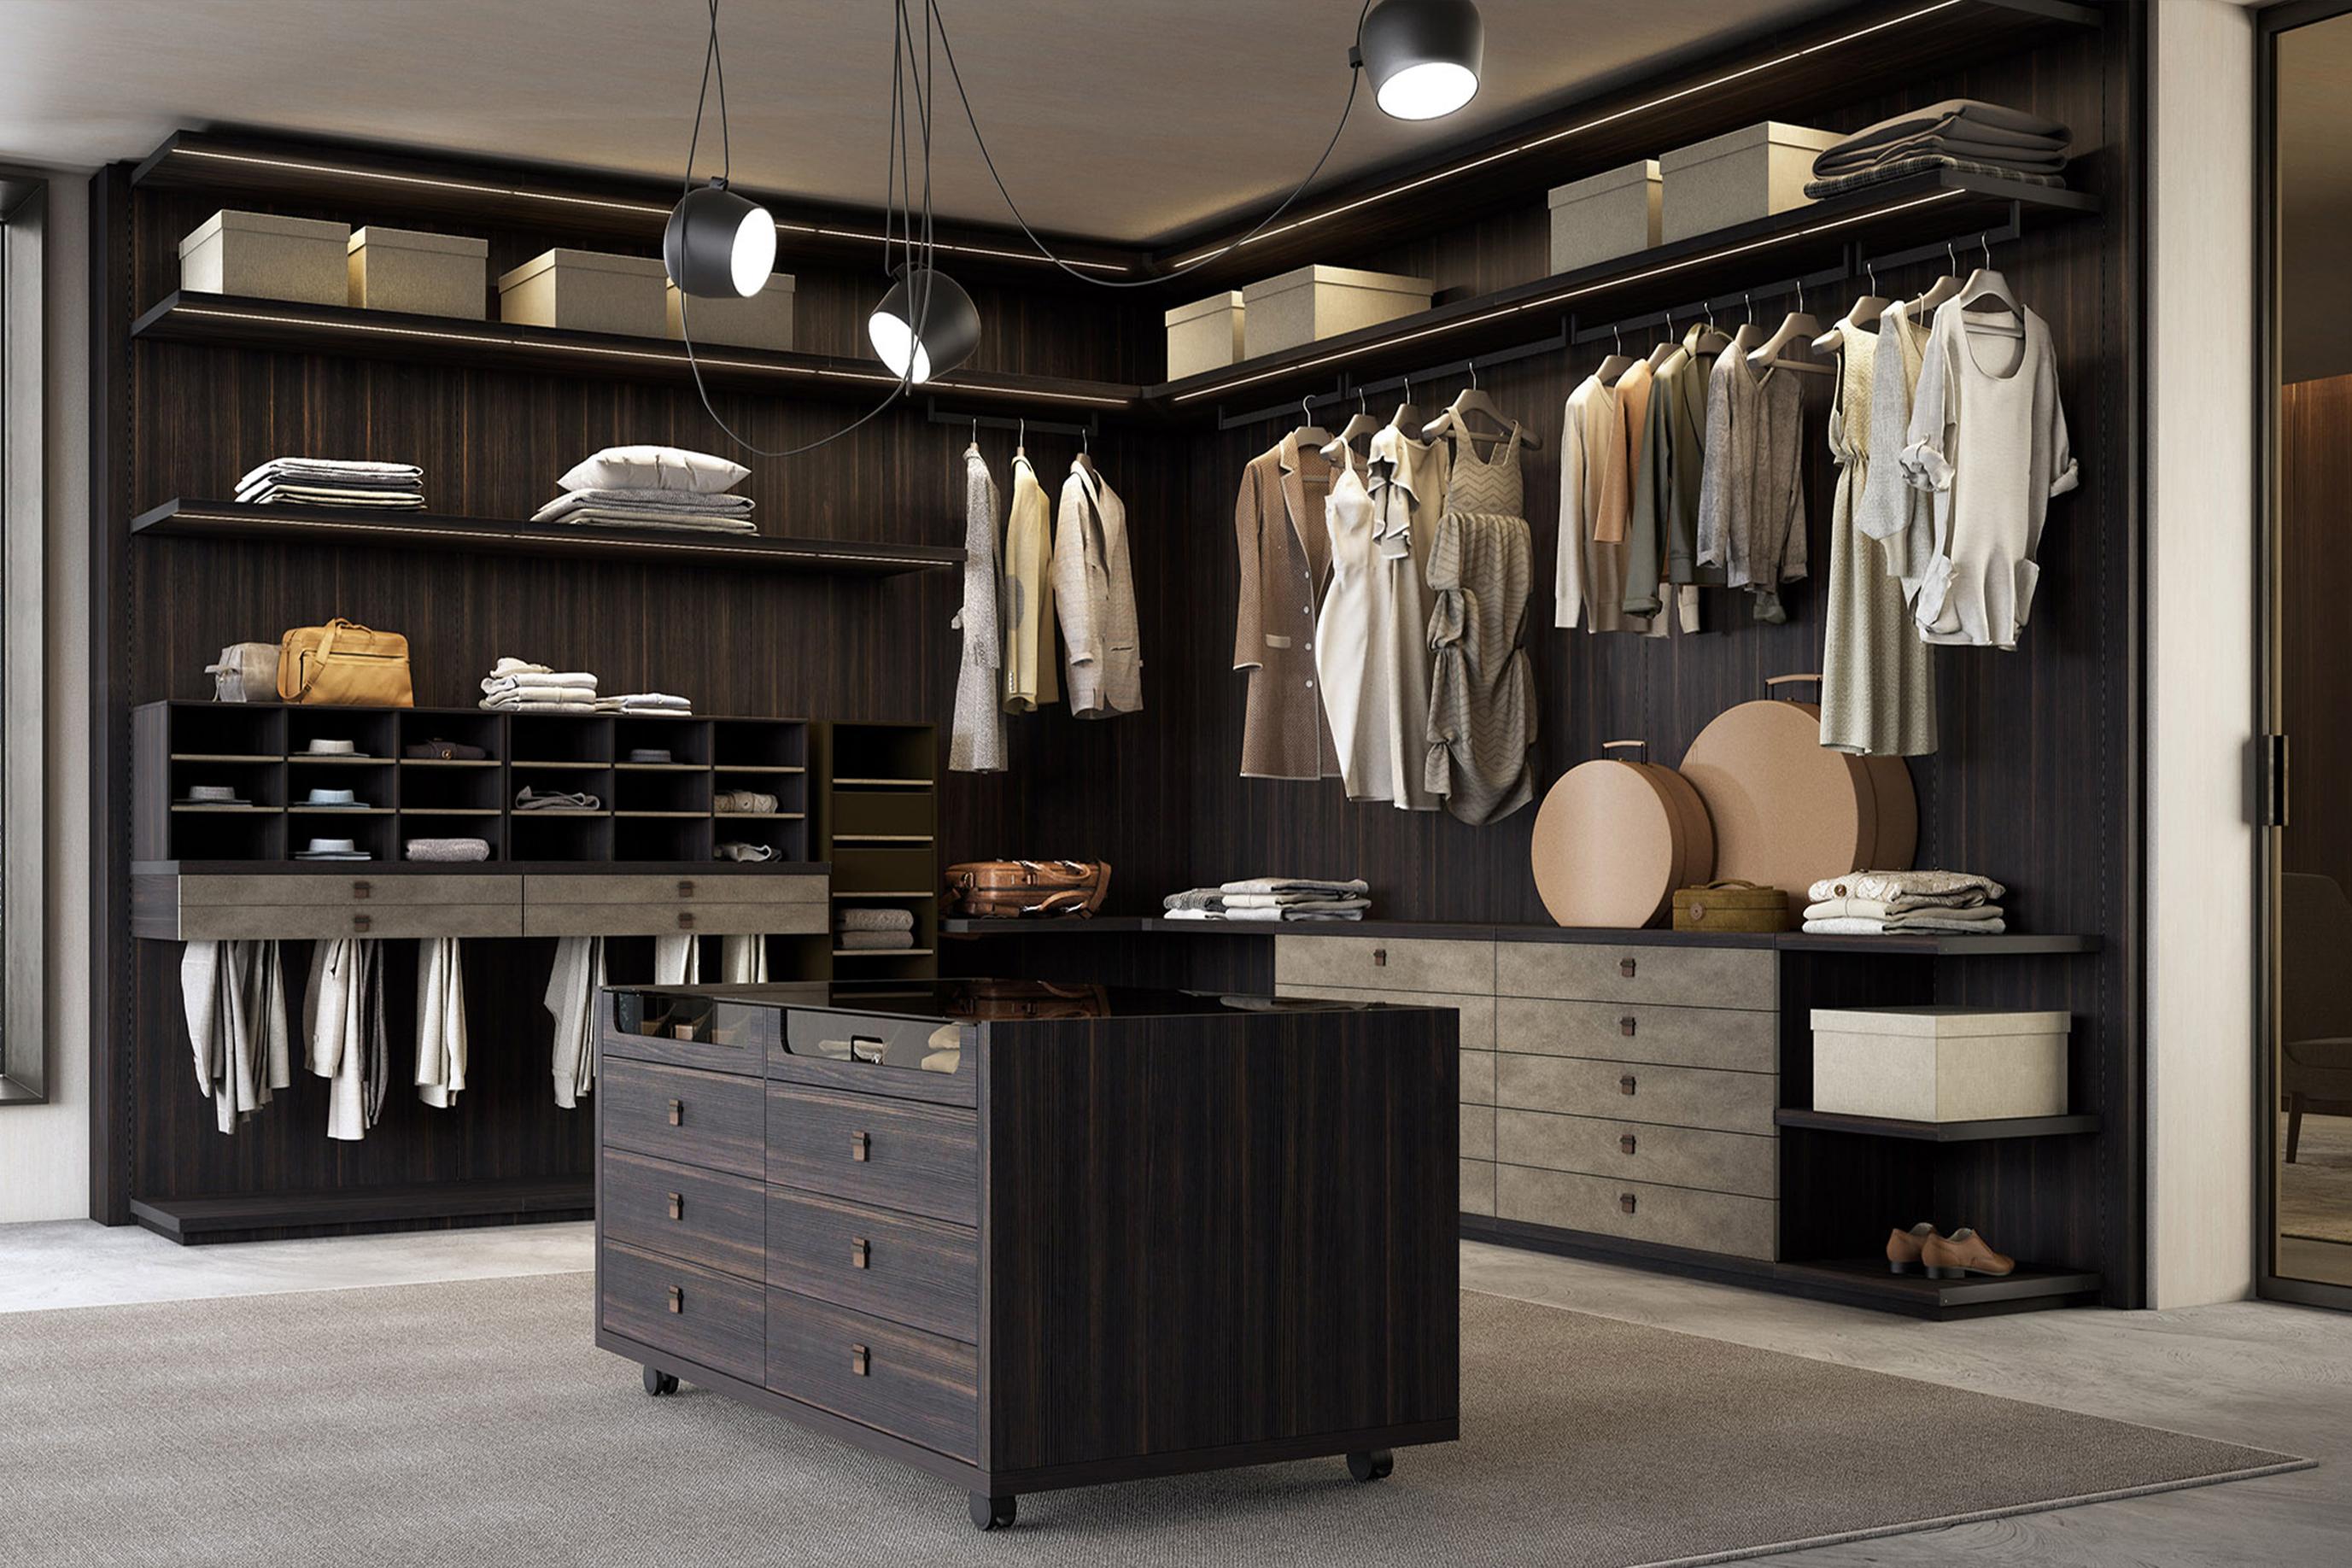 Cabine armadio moderne | Fimes